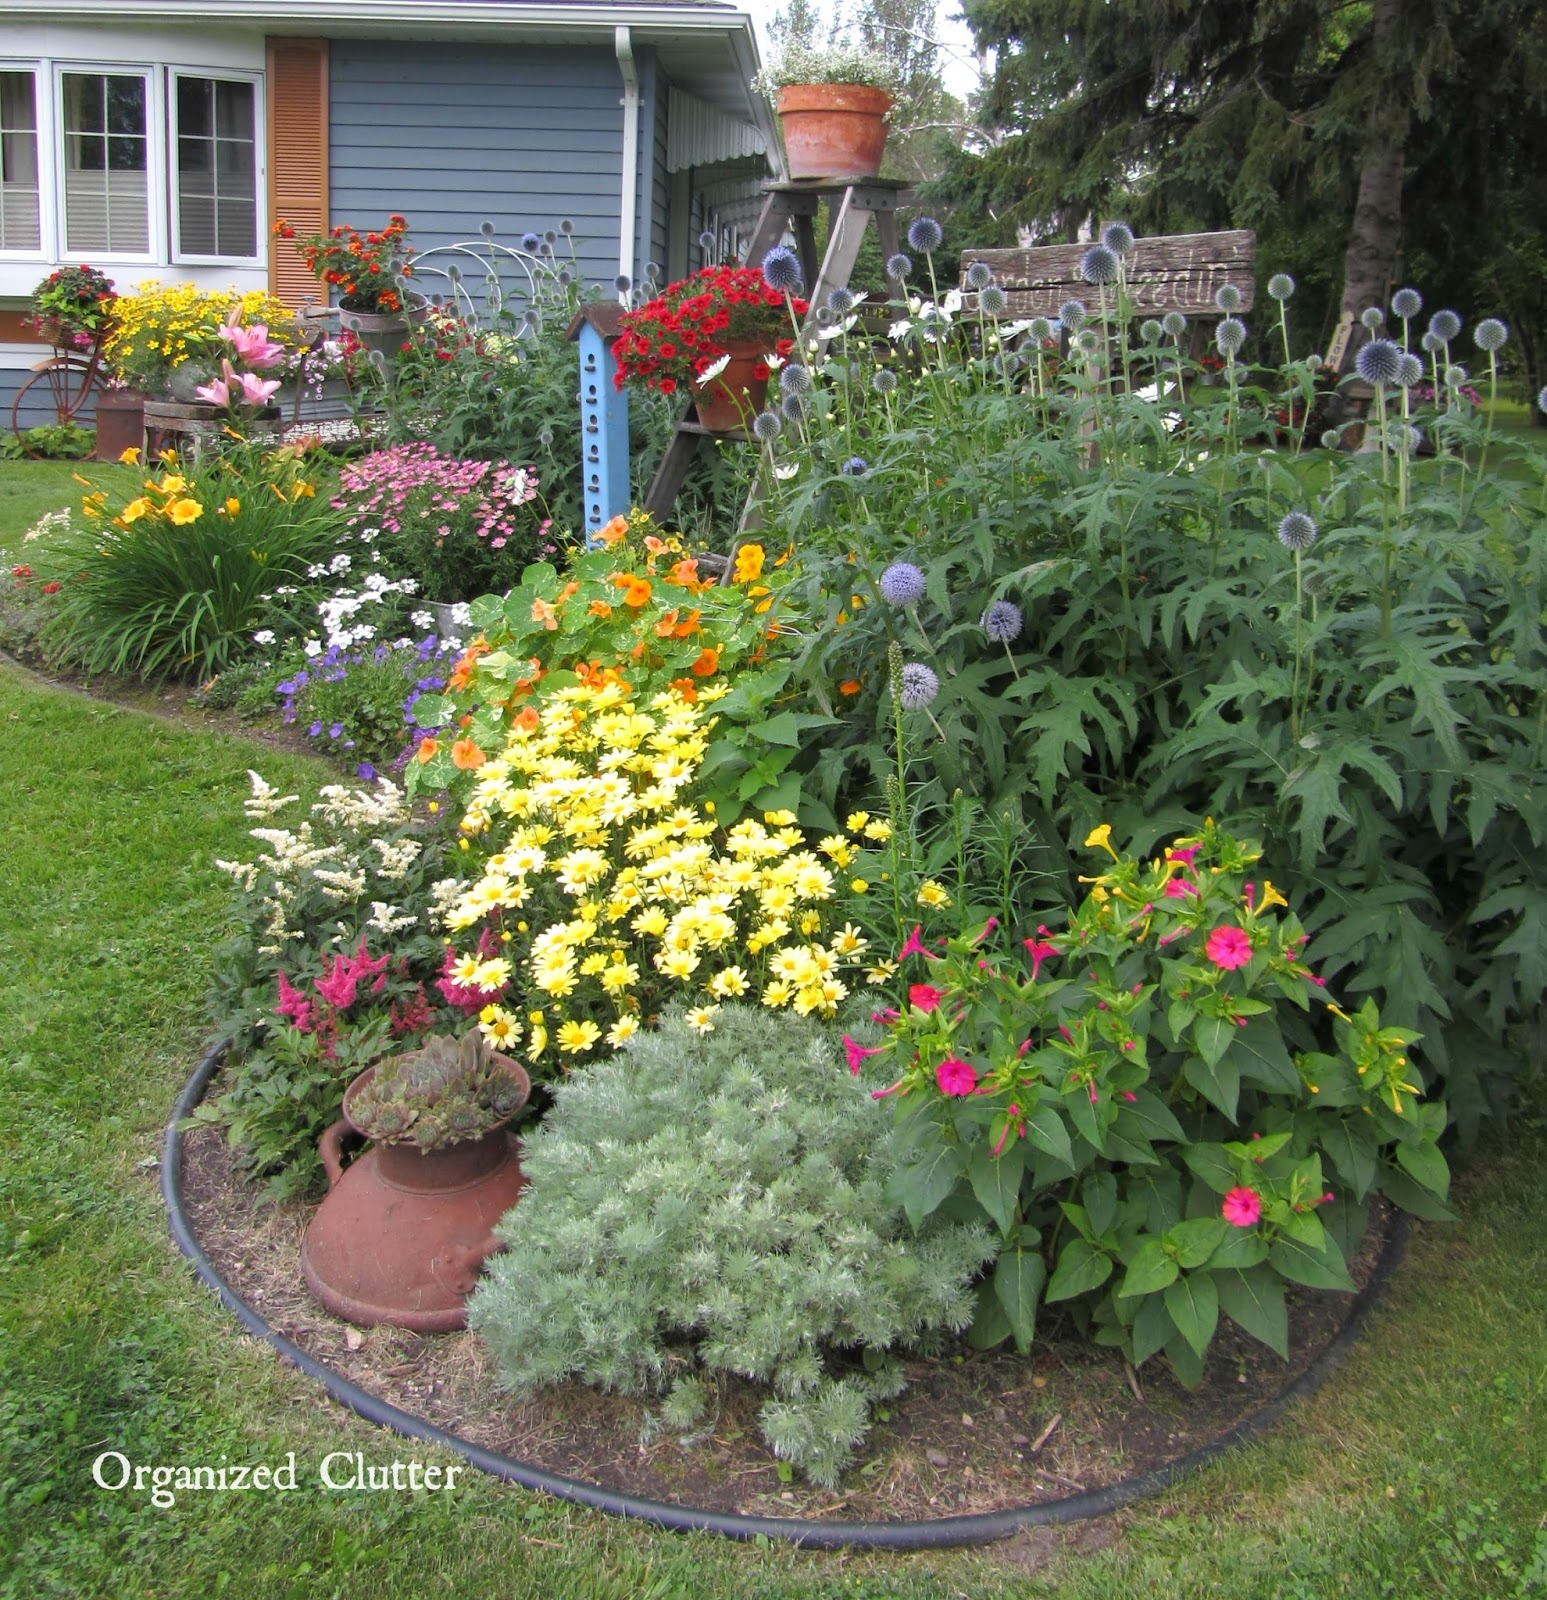 Ideas For Flowers In Backyard: Garden Junk Ideas Galore 2014 Round Up